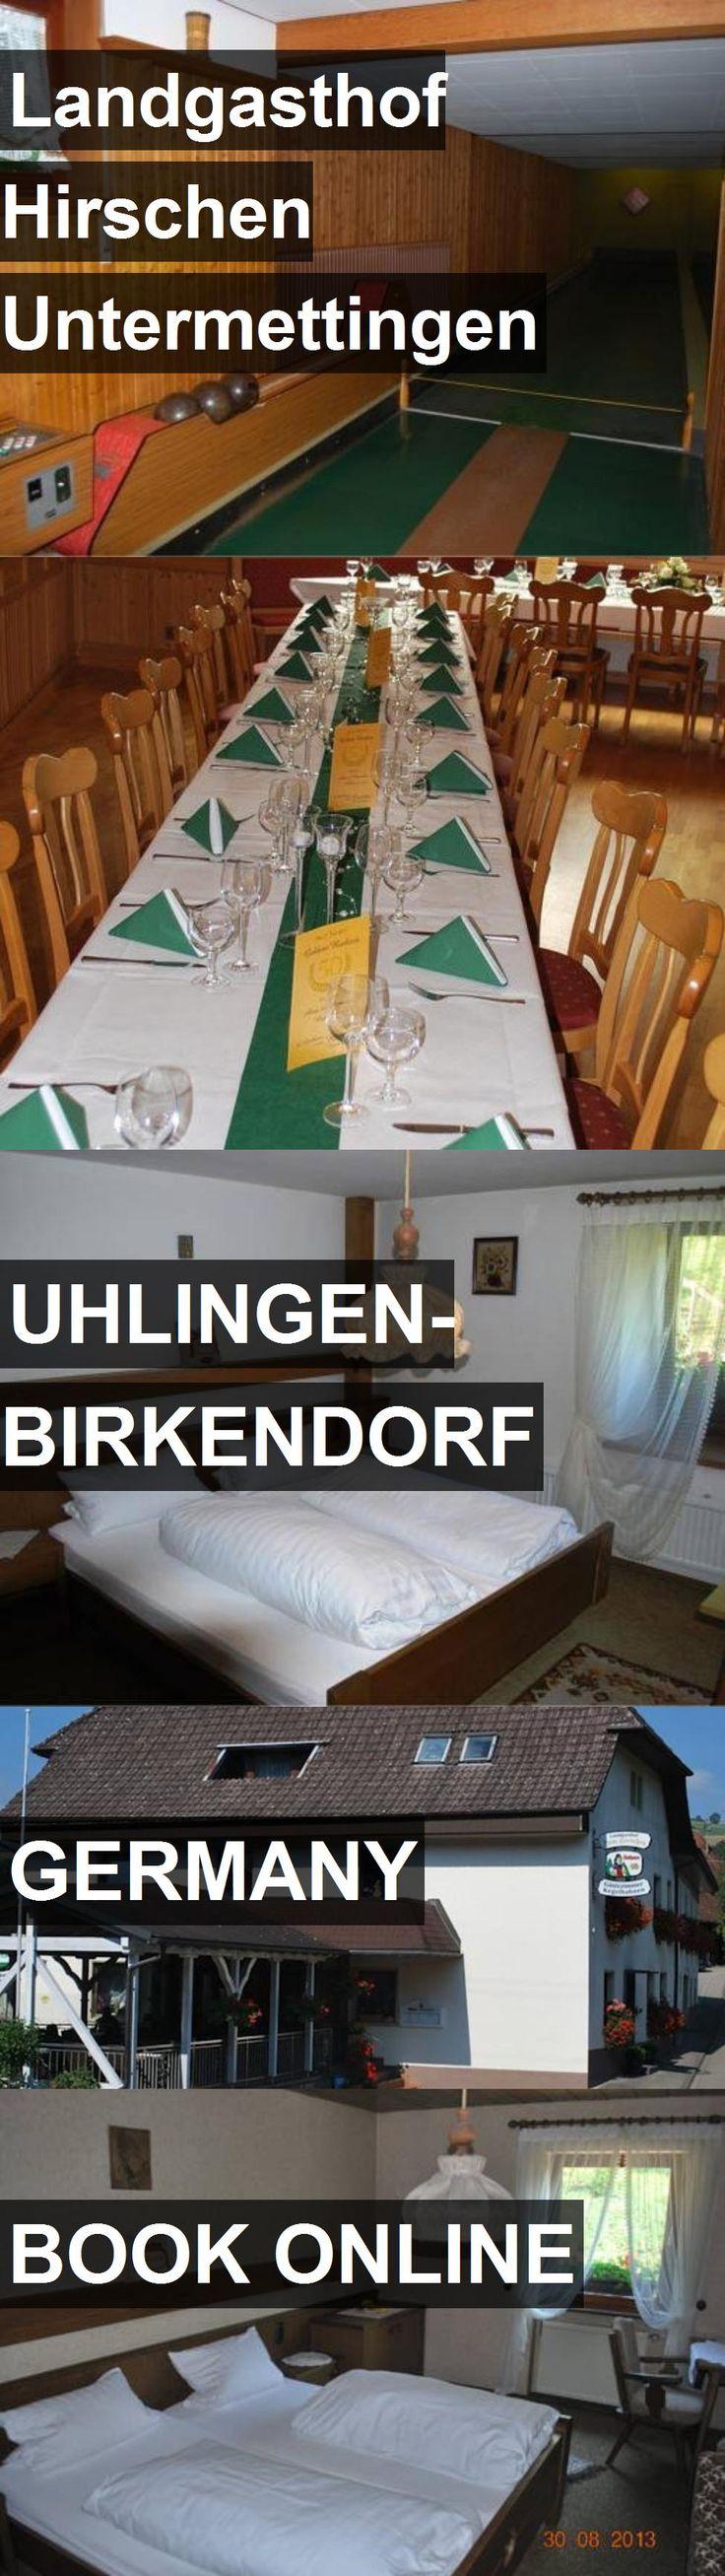 Hotel Landgasthof Hirschen Untermettingen in Uhlingen-Birkendorf, Germany. For more information, photos, reviews and best prices please follow the link. #Germany #Uhlingen-Birkendorf #travel #vacation #hotel